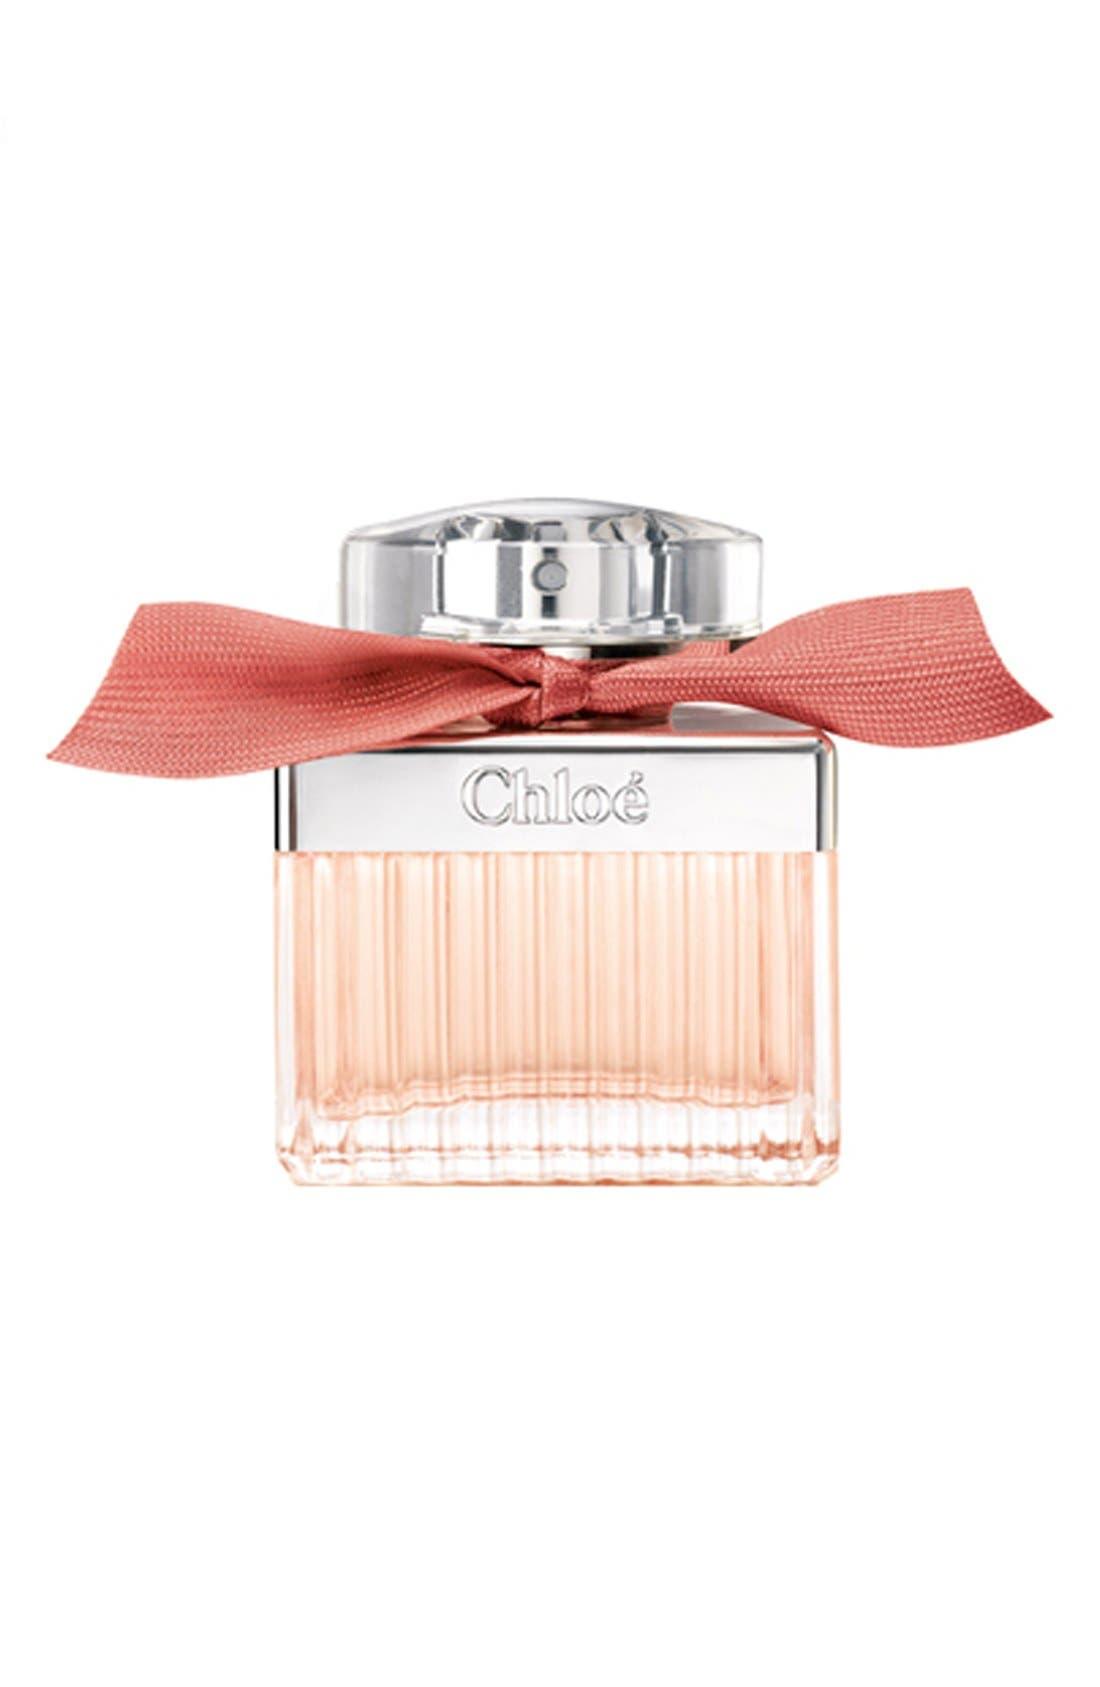 Chloé 'Roses de Chloé' Eau de Toilette Spray